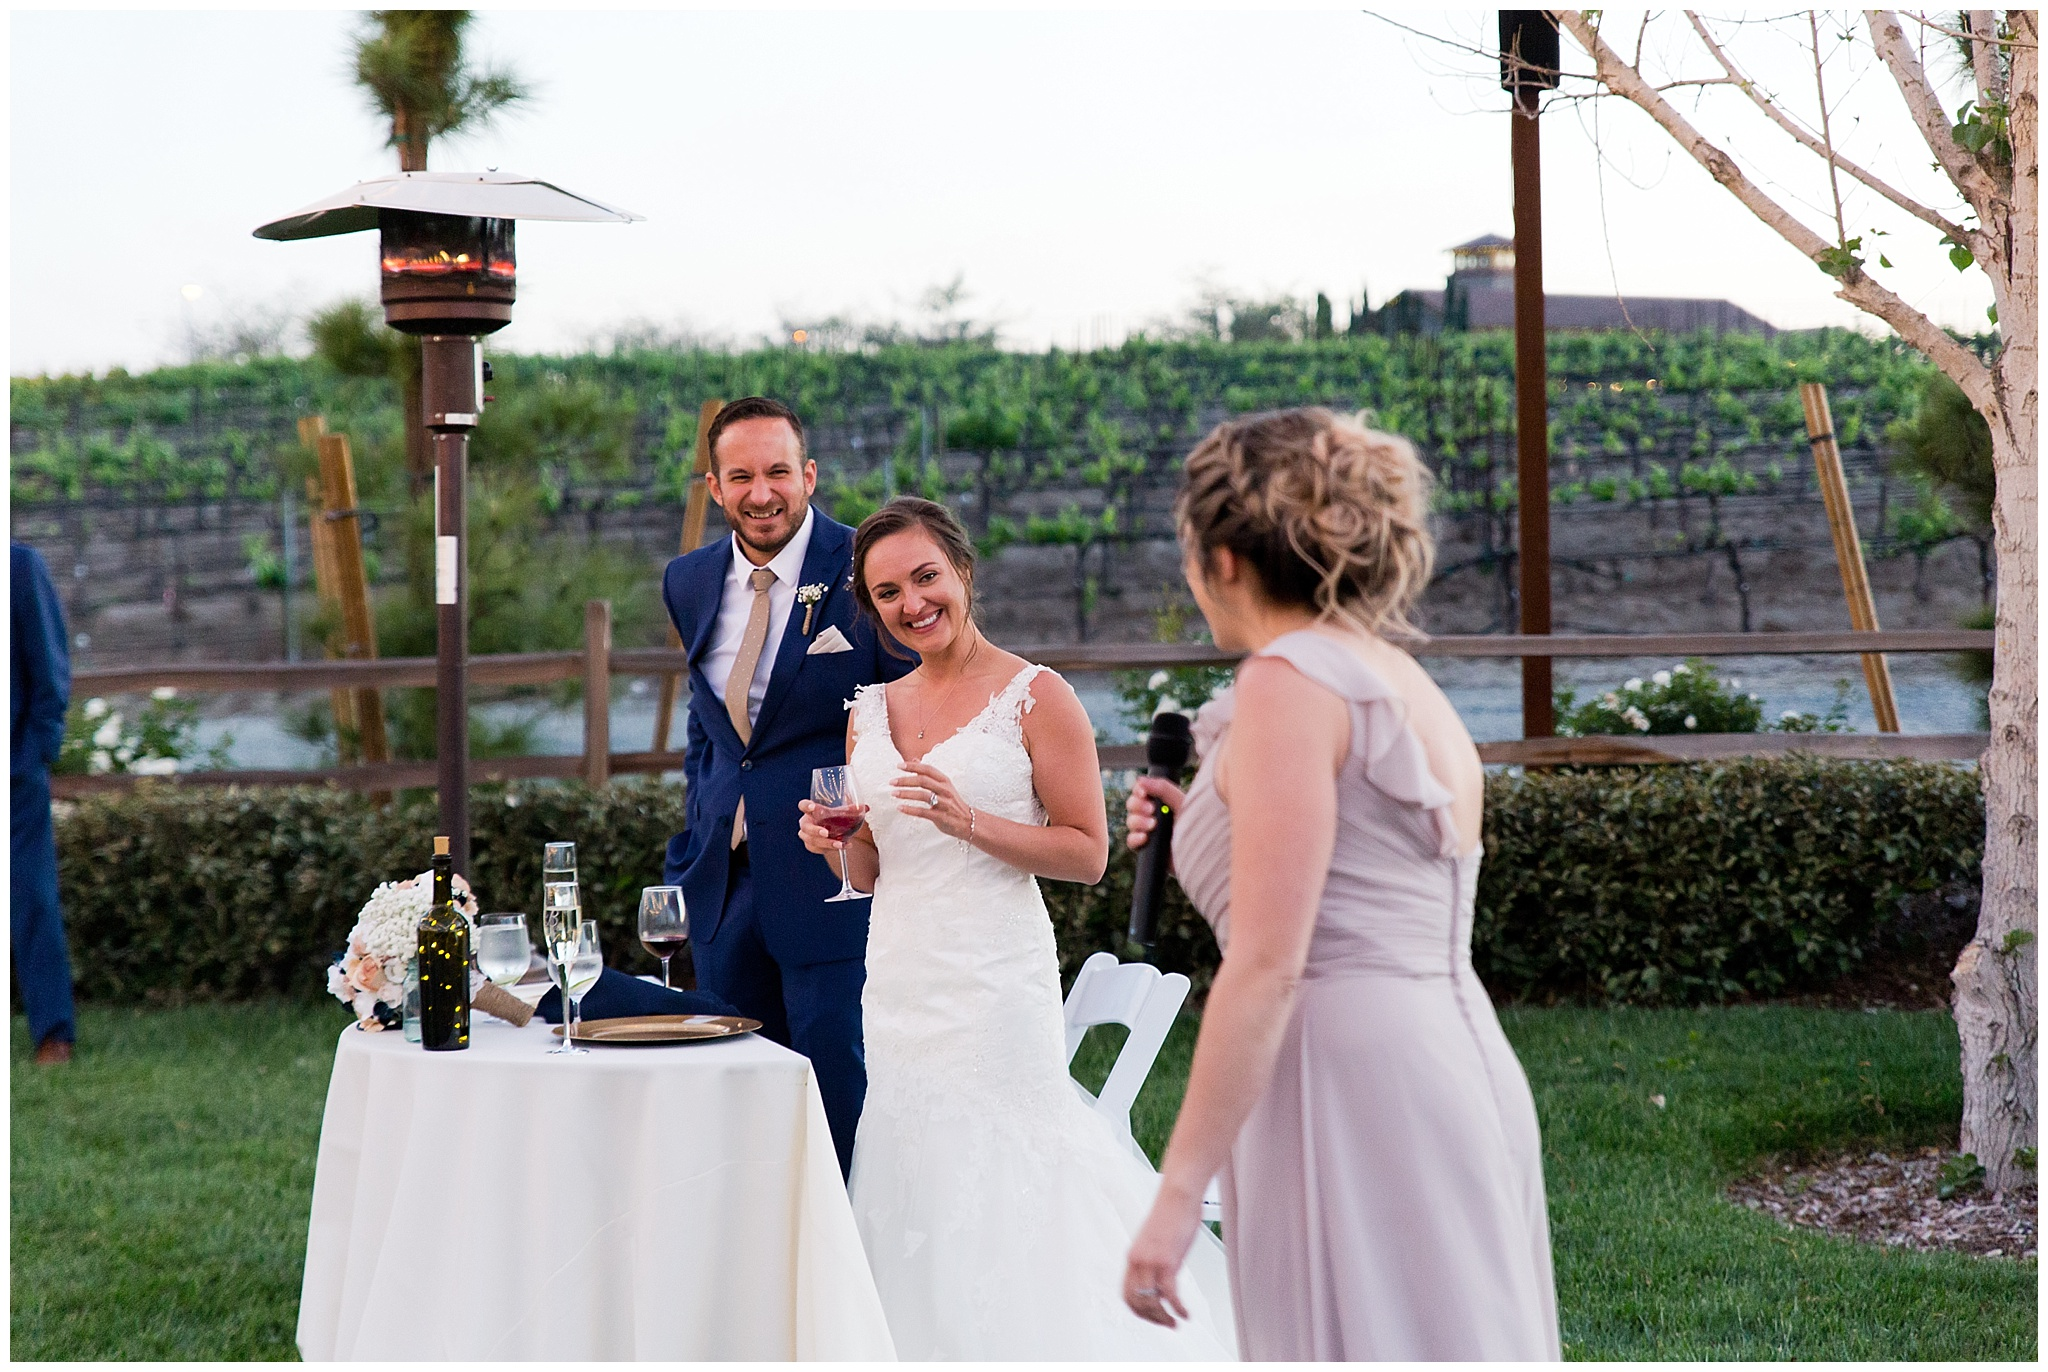 Vinny-Cayt-Wedding-04-26-18-1975.jpg